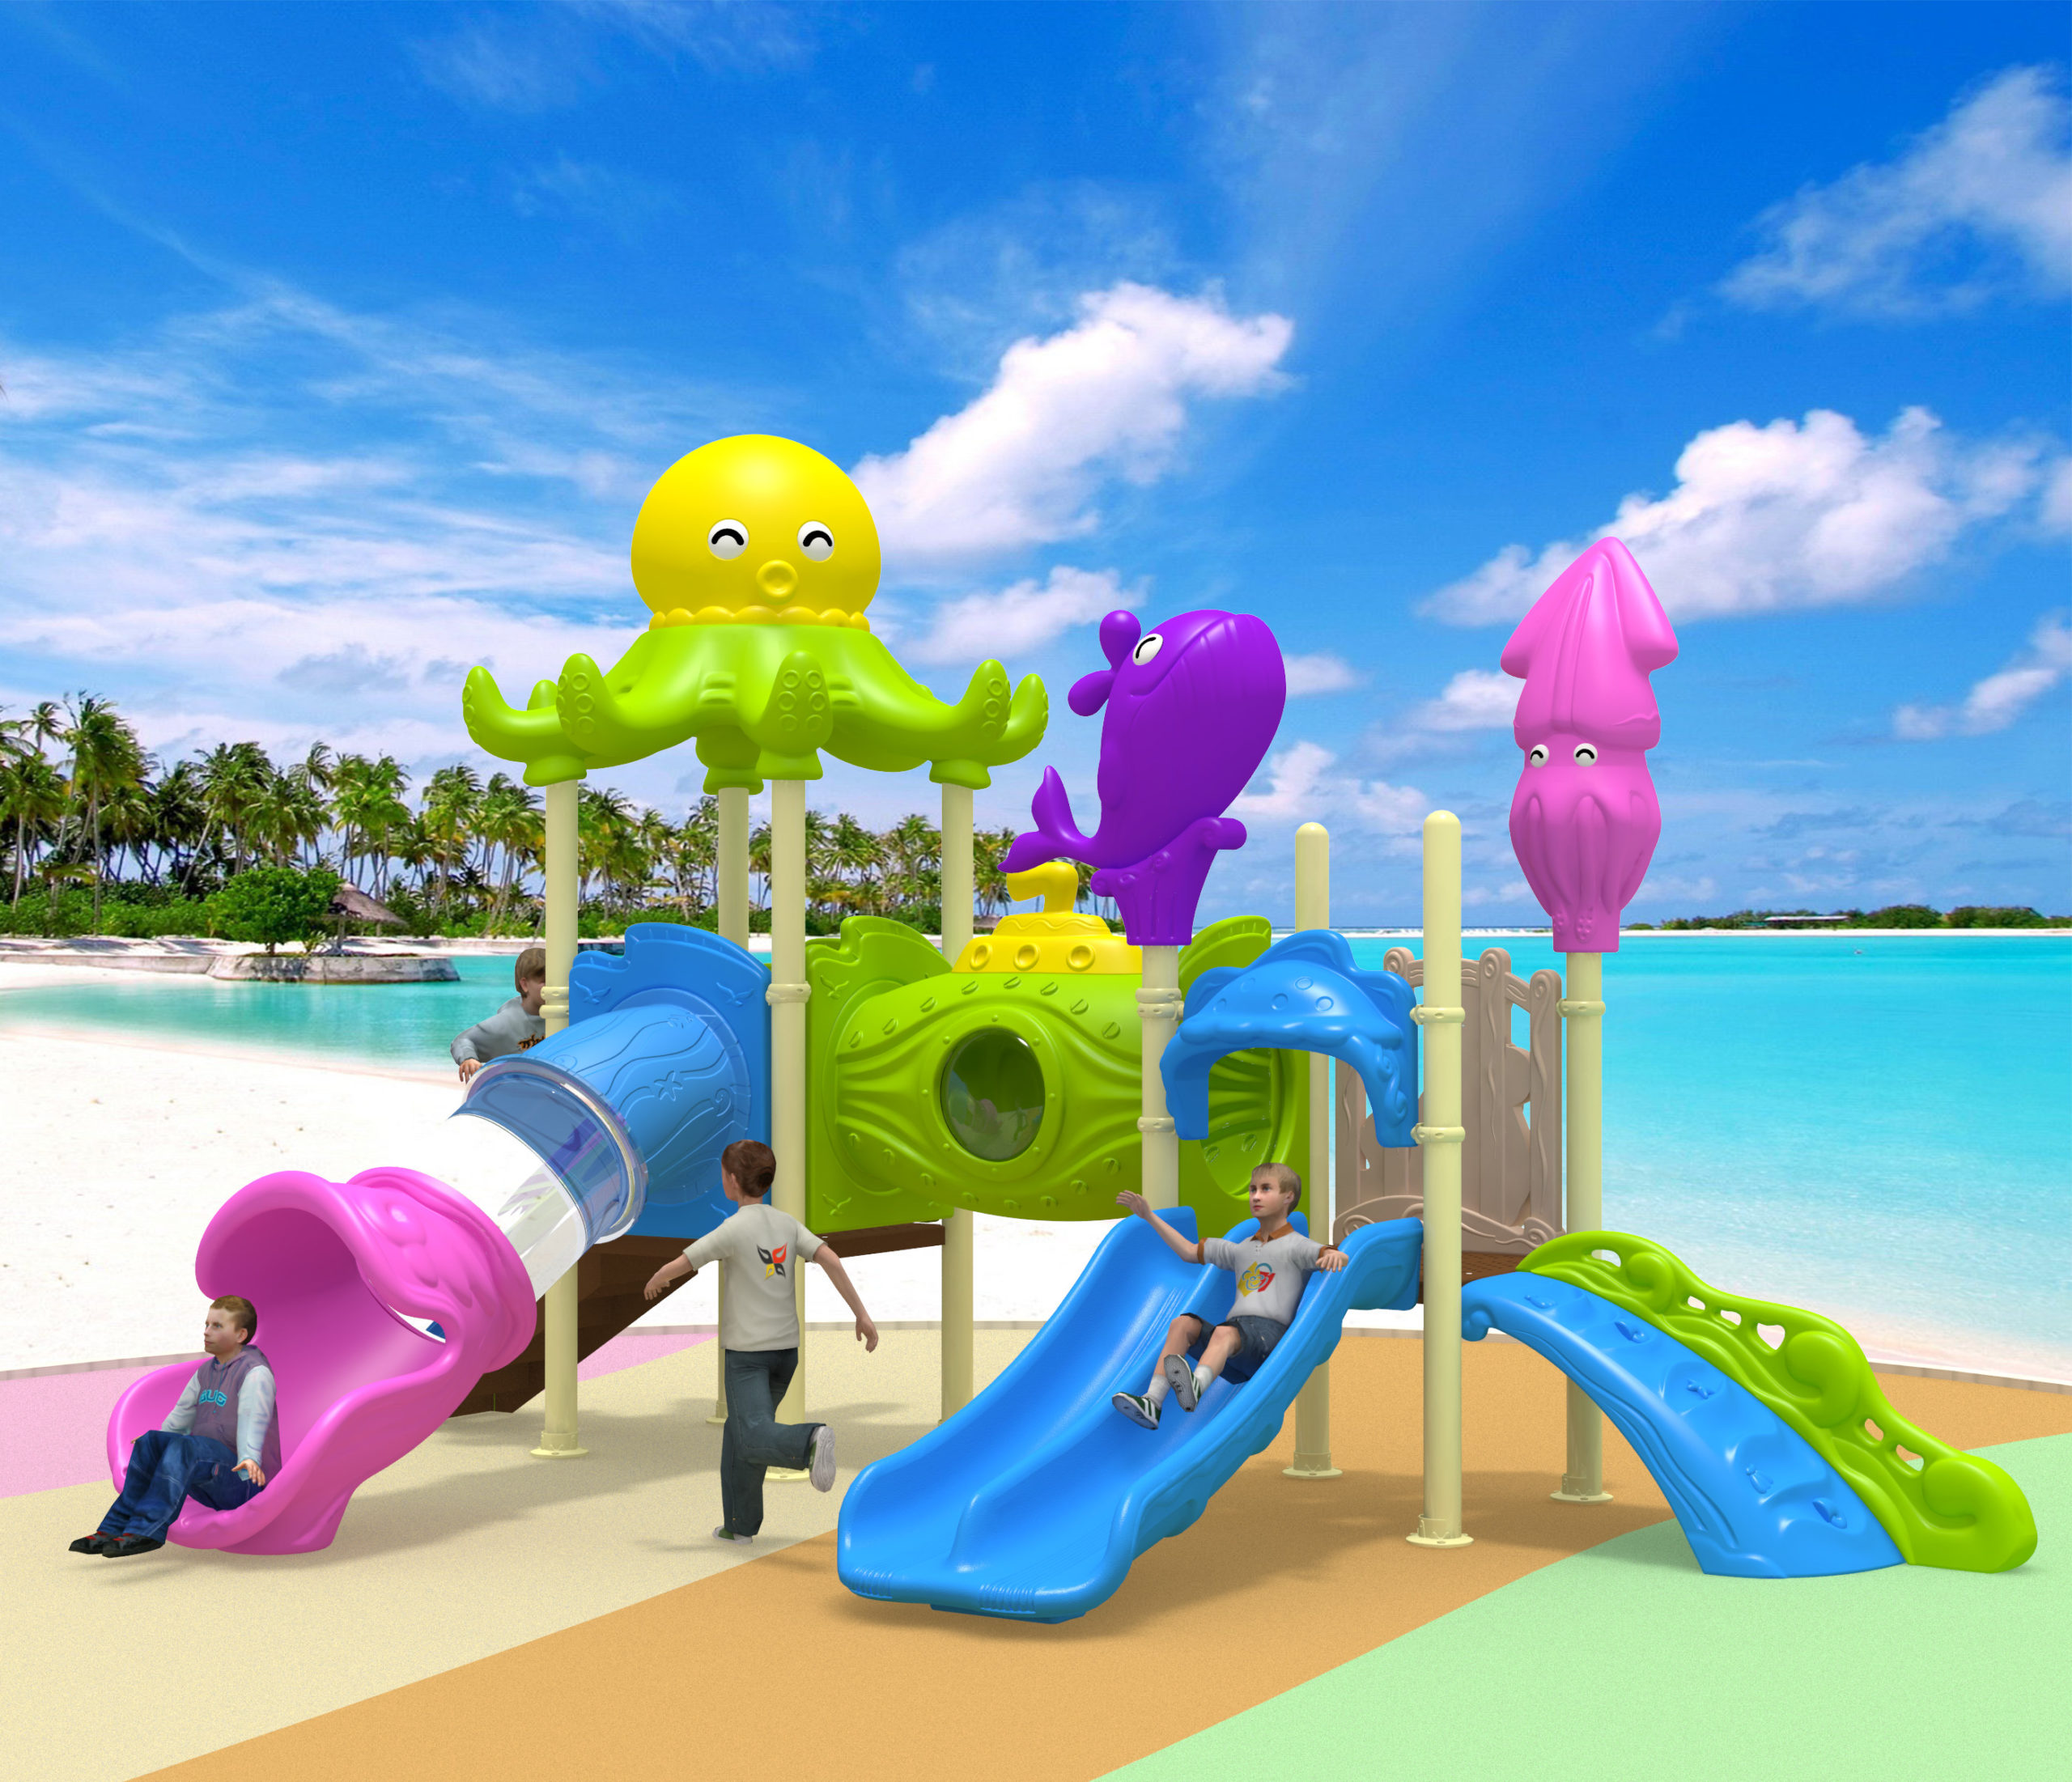 KIDS EQUIPMENT: SQUID ADVENTURE PLAYGROUND [DFC 128-2]